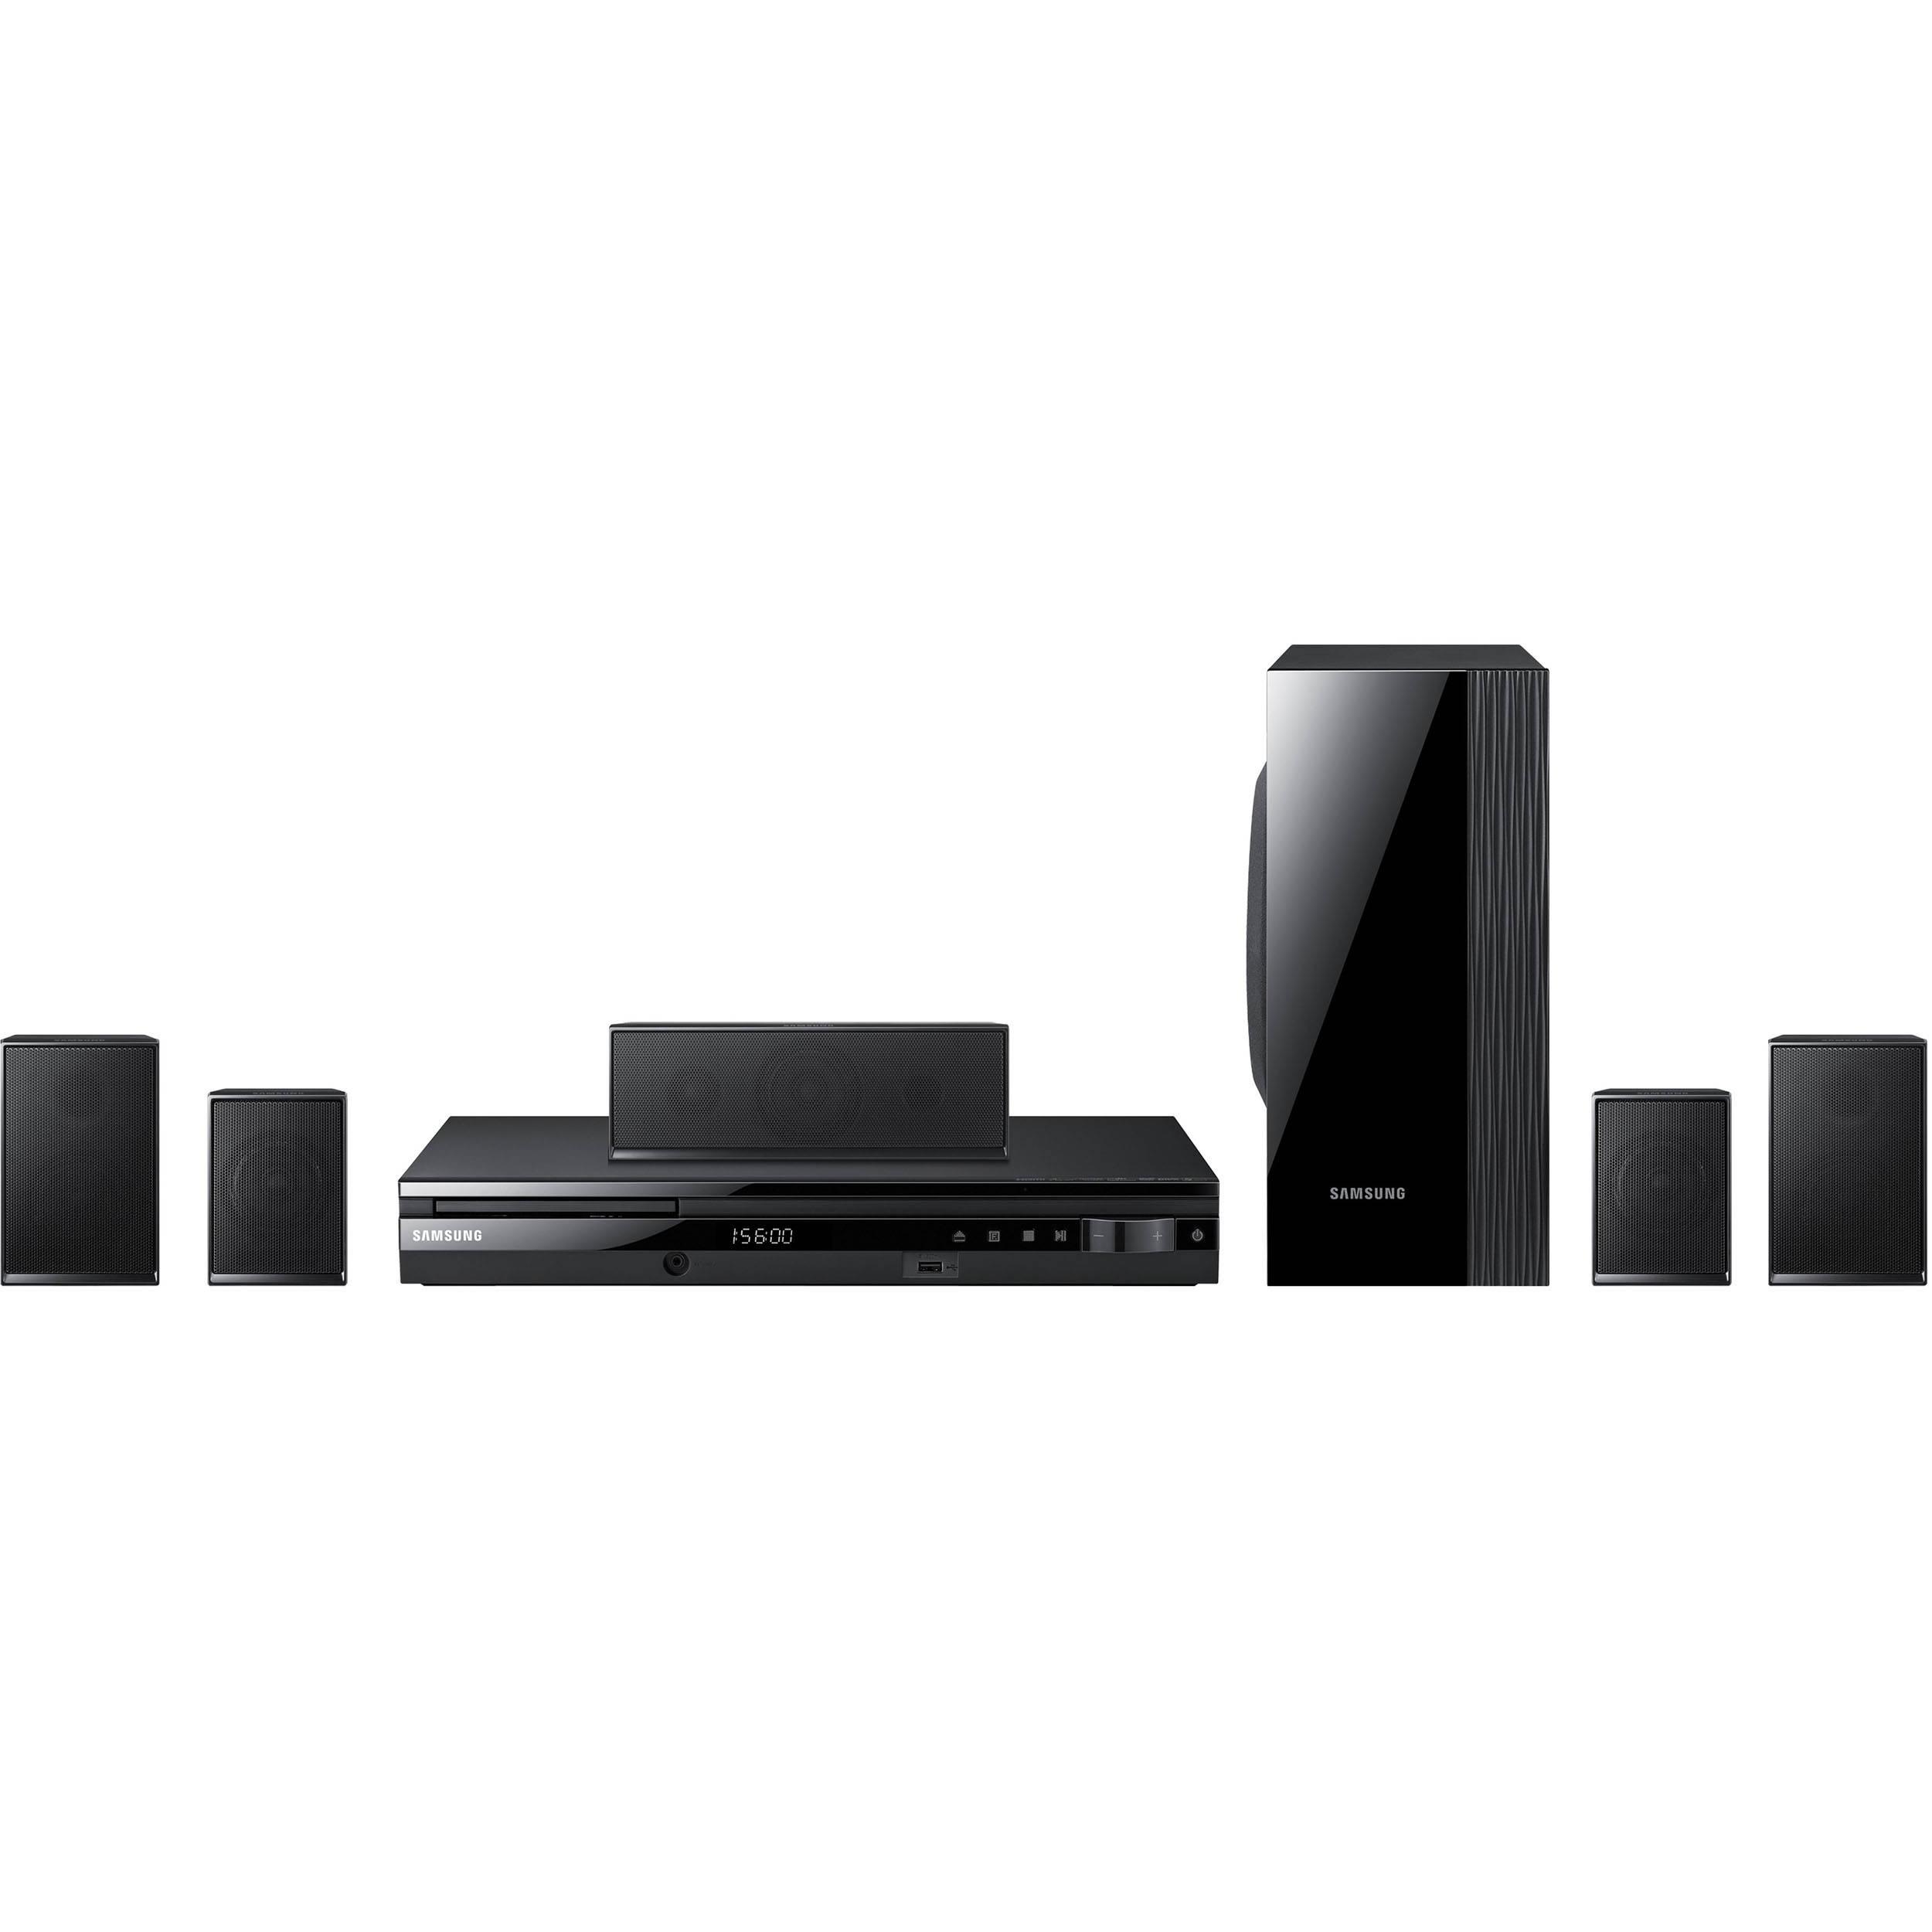 samsung ht e550 digital home entertainment system ht e550 b h. Black Bedroom Furniture Sets. Home Design Ideas